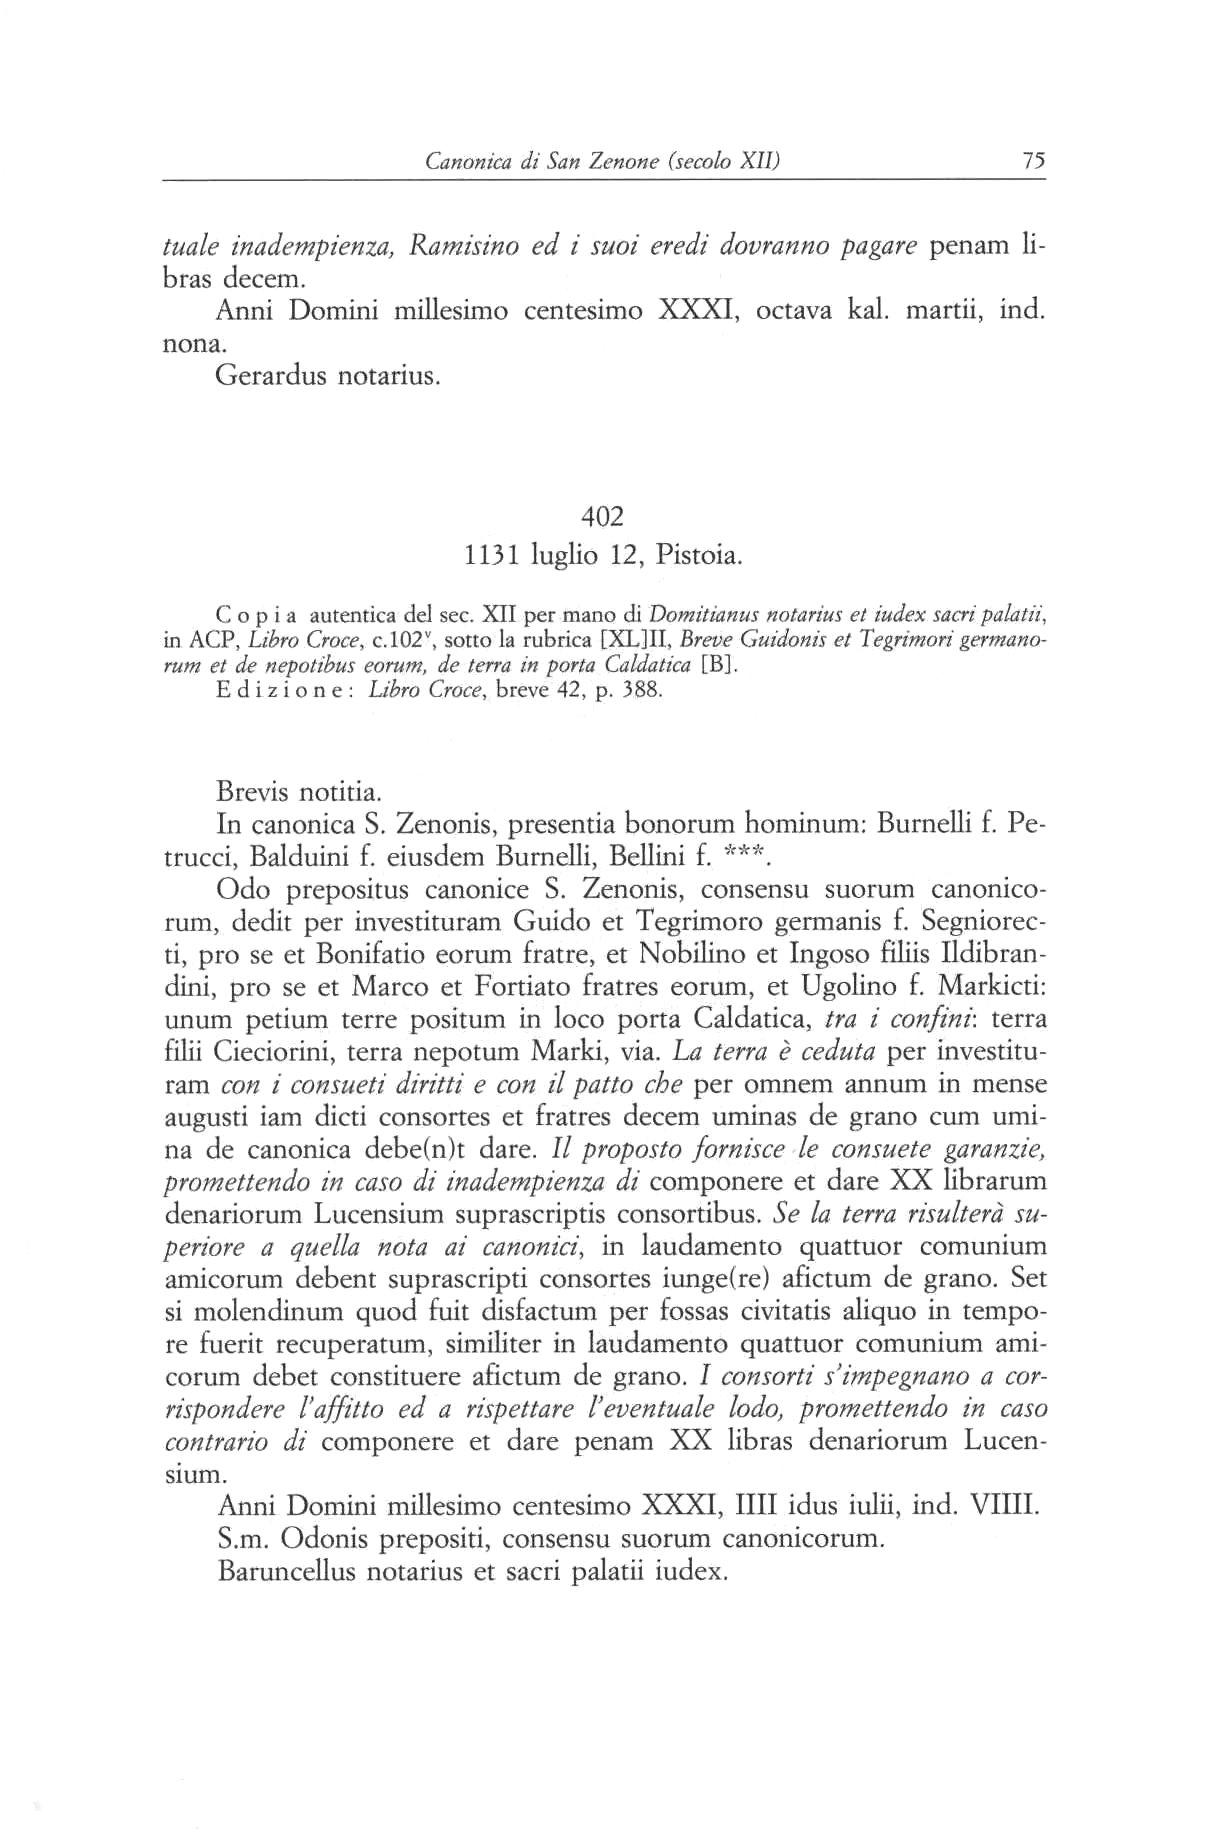 Canonica S. Zenone XII 0075.jpg